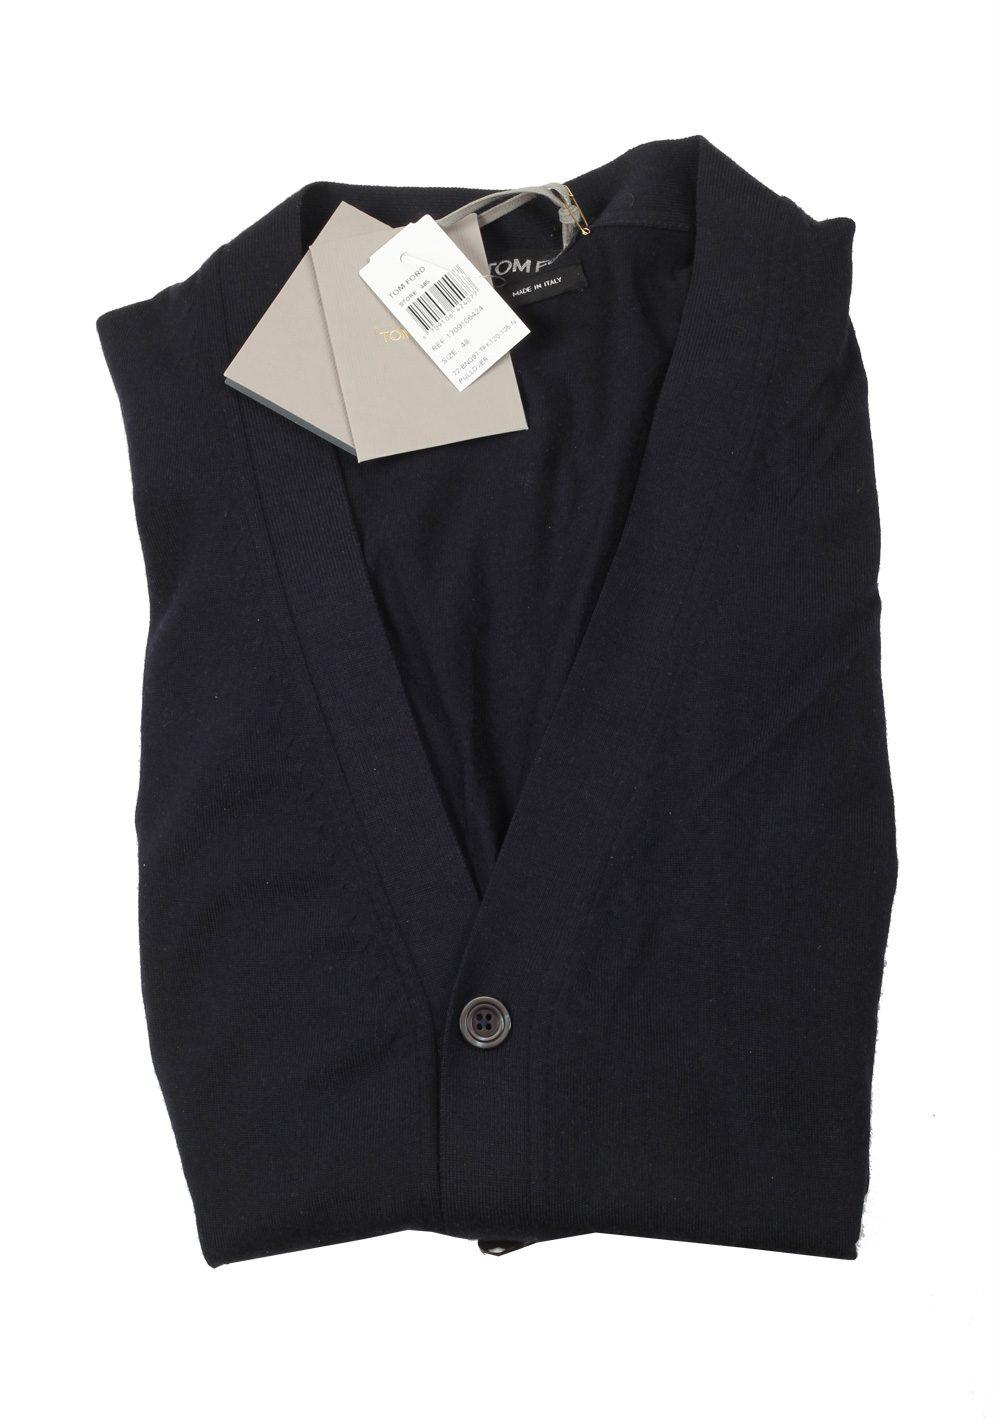 TOM FORD Blue Cardigan Size 48 / 38R U.S. in Wool   Costume Limité